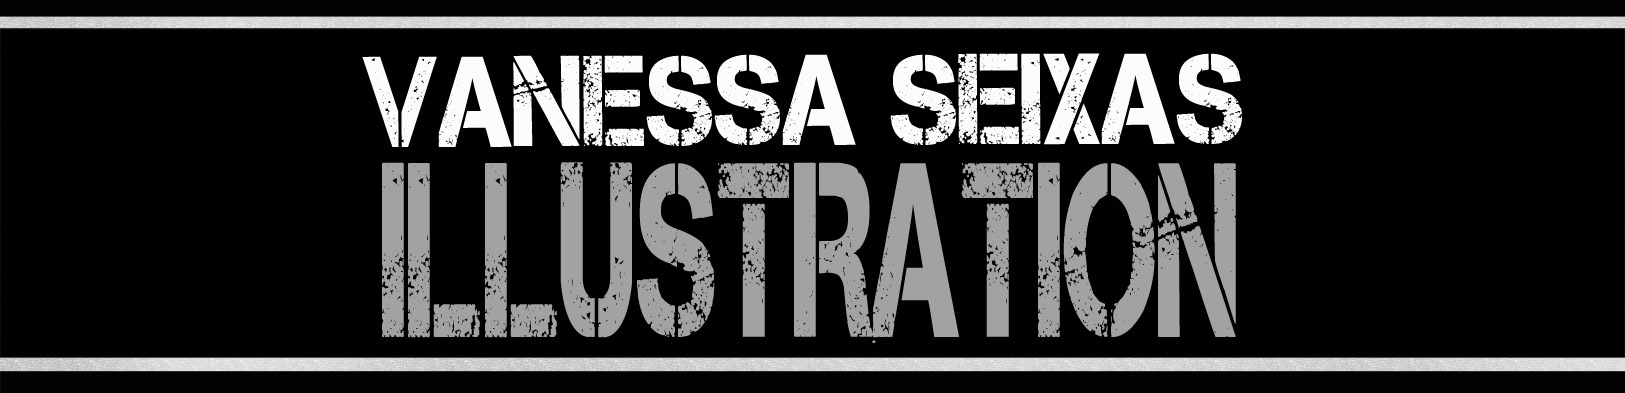 Vanessa Seixas